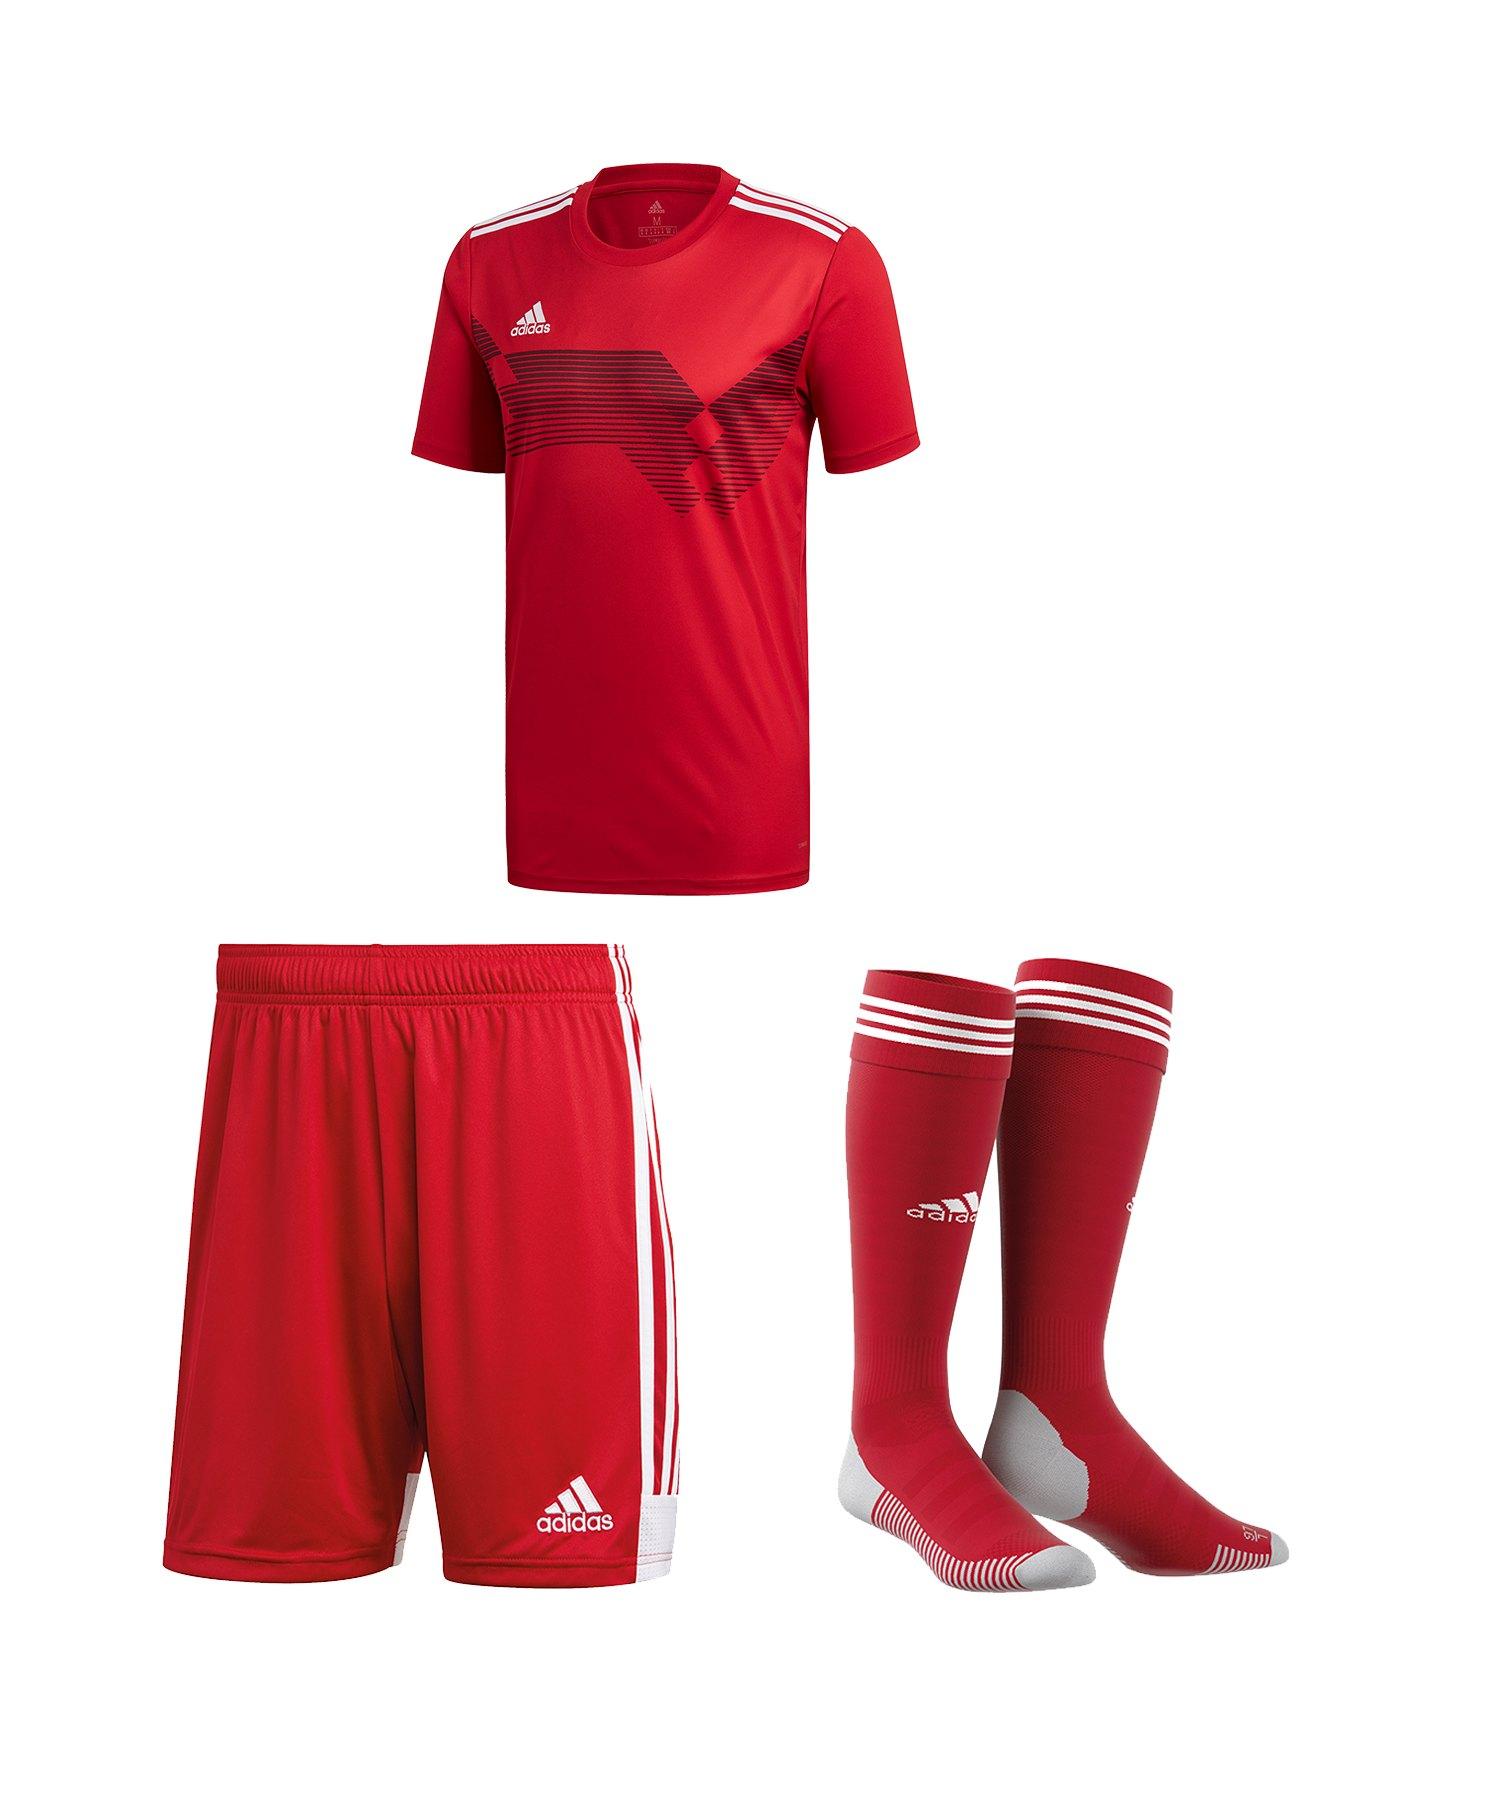 adidas Campeon 19 Trikotset Rot Weiss - rot